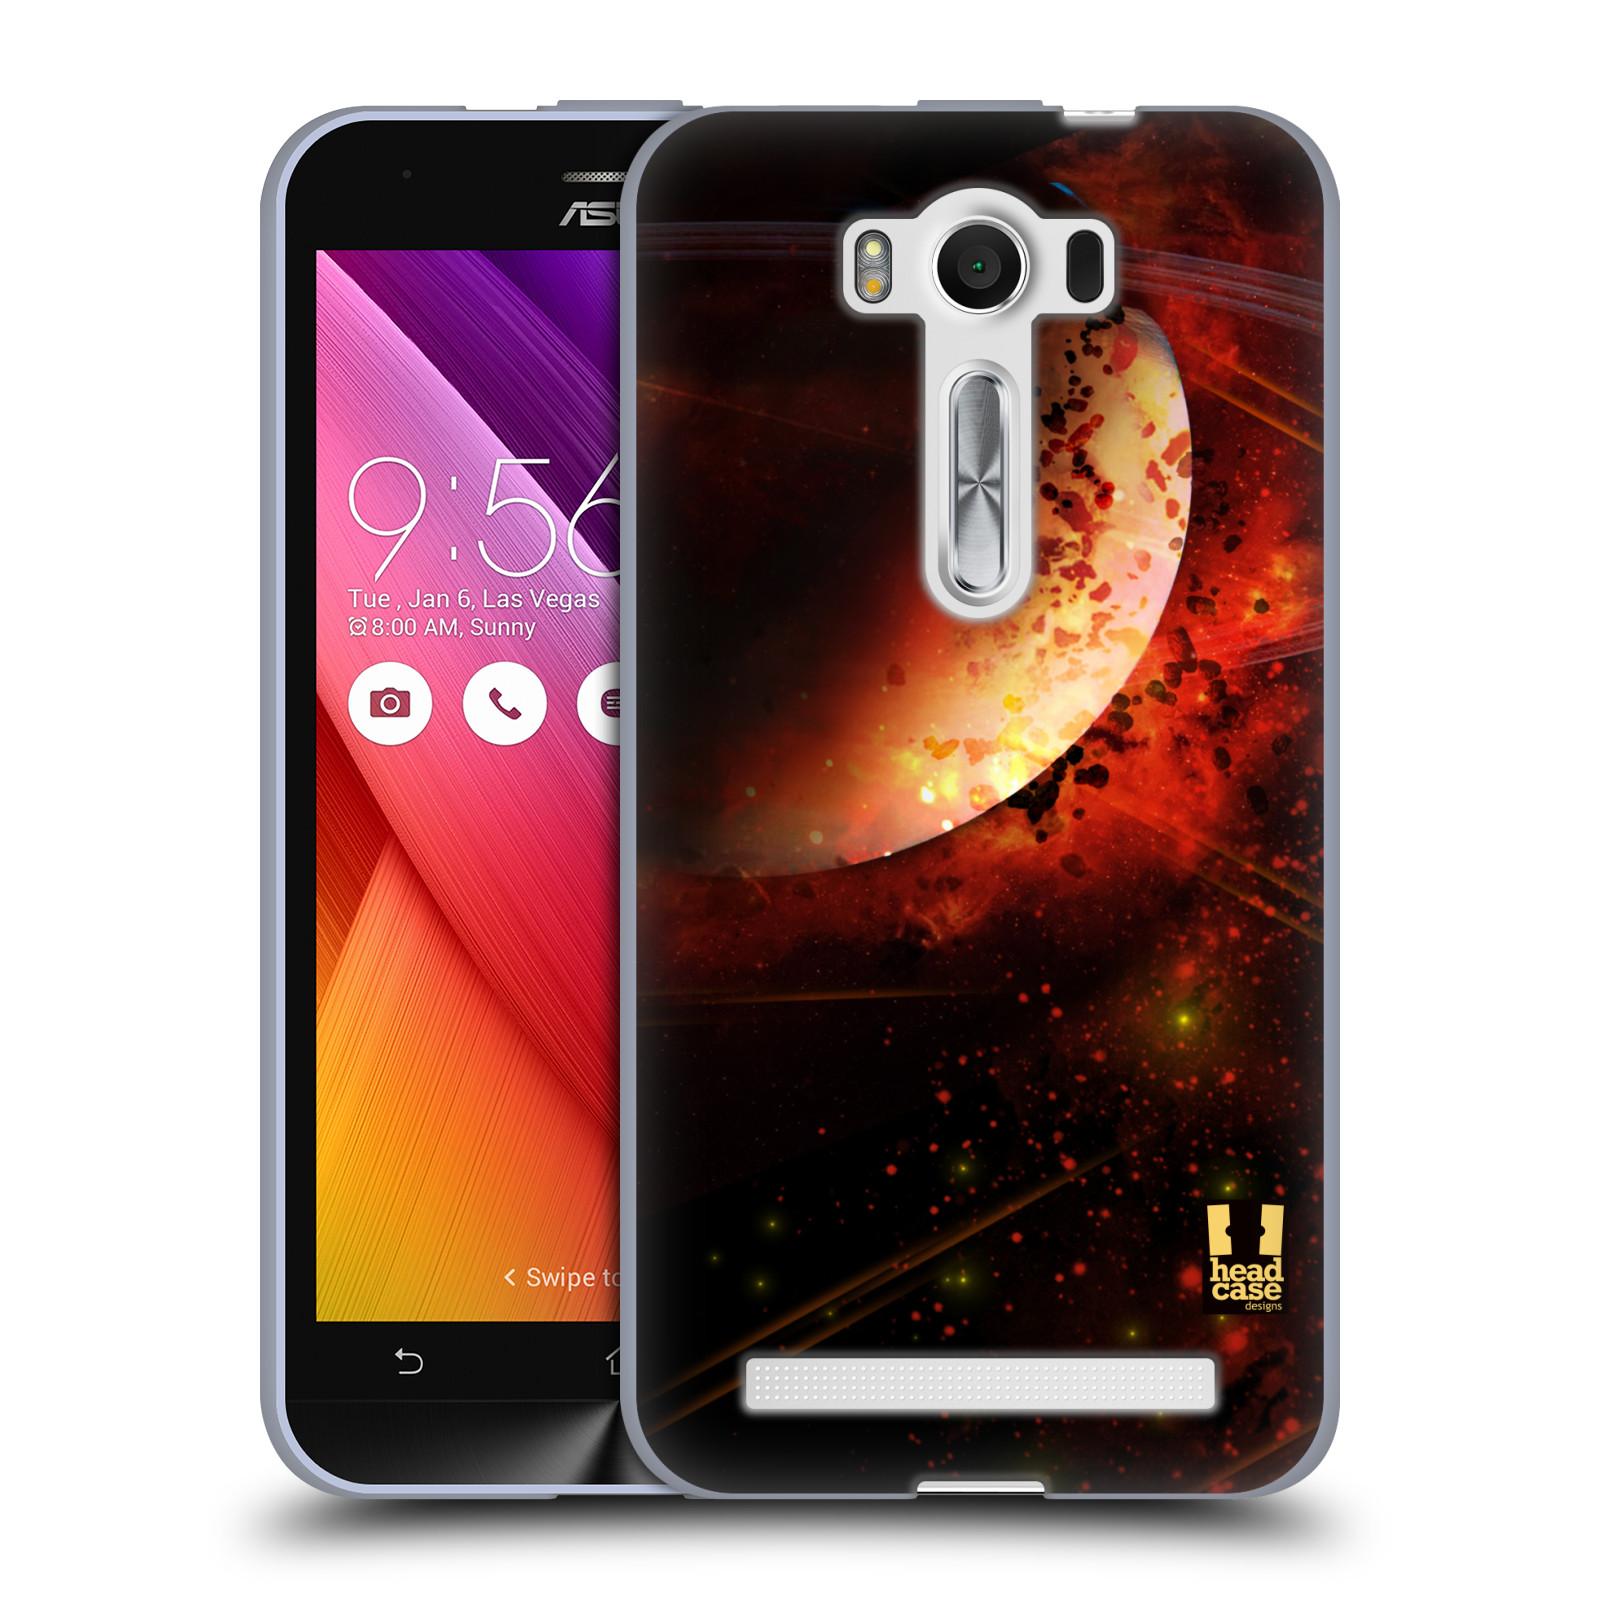 "Silikonové pouzdro na mobil Asus ZenFone 2 Laser ZE500KL HEAD CASE SATURN (Silikonový kryt či obal na mobilní telefon Asus ZenFone 2 Laser ZE500KL s 5"" displejem)"